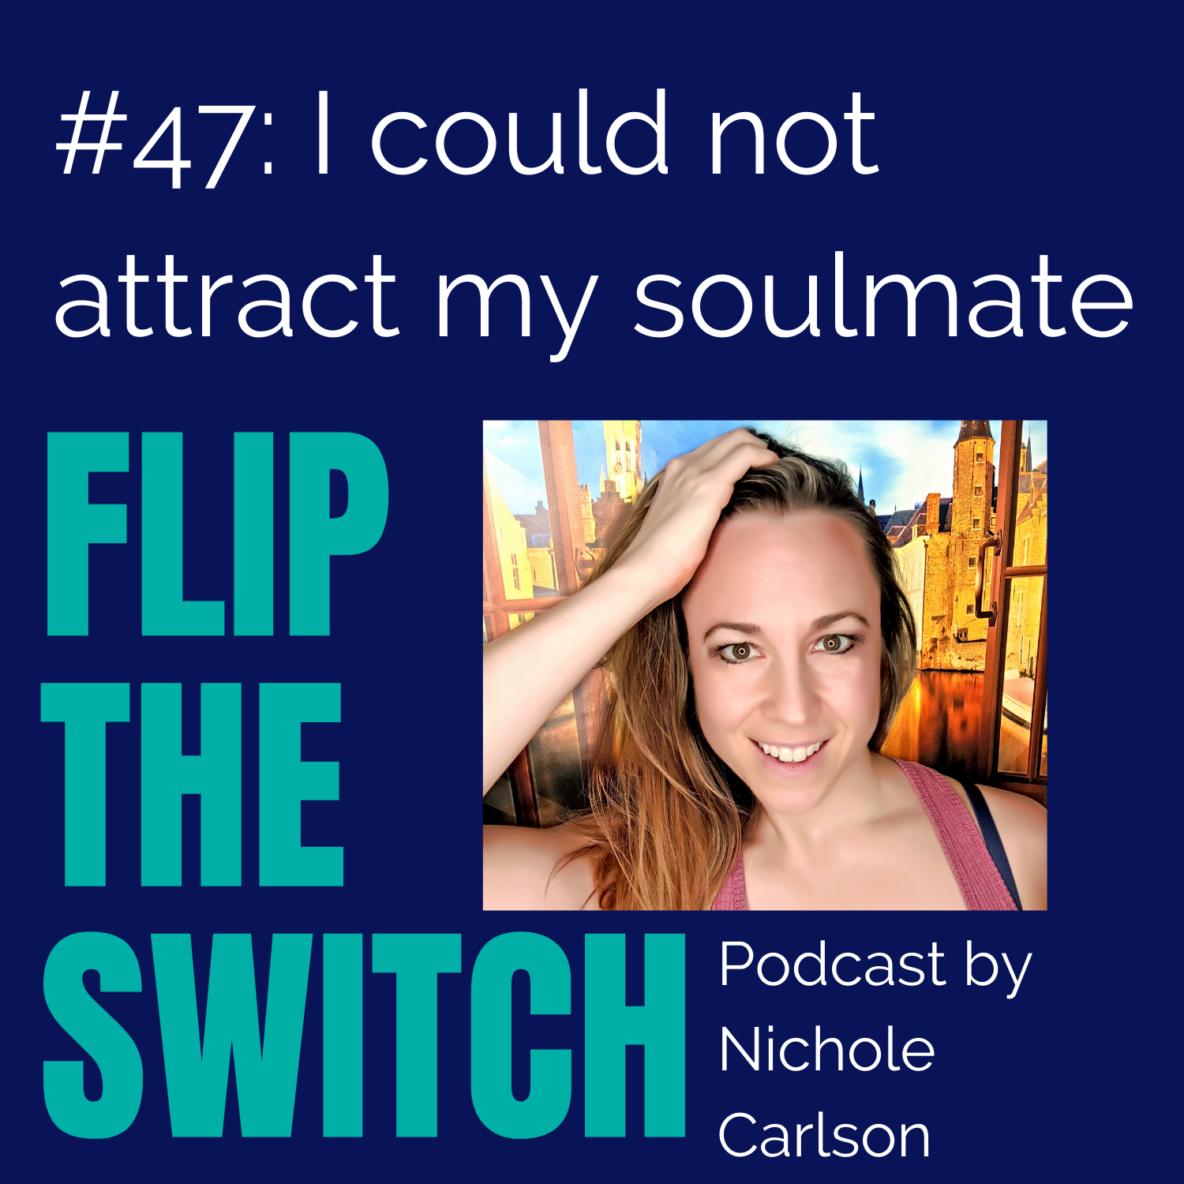 Nichole Carlson, Flip the Switch